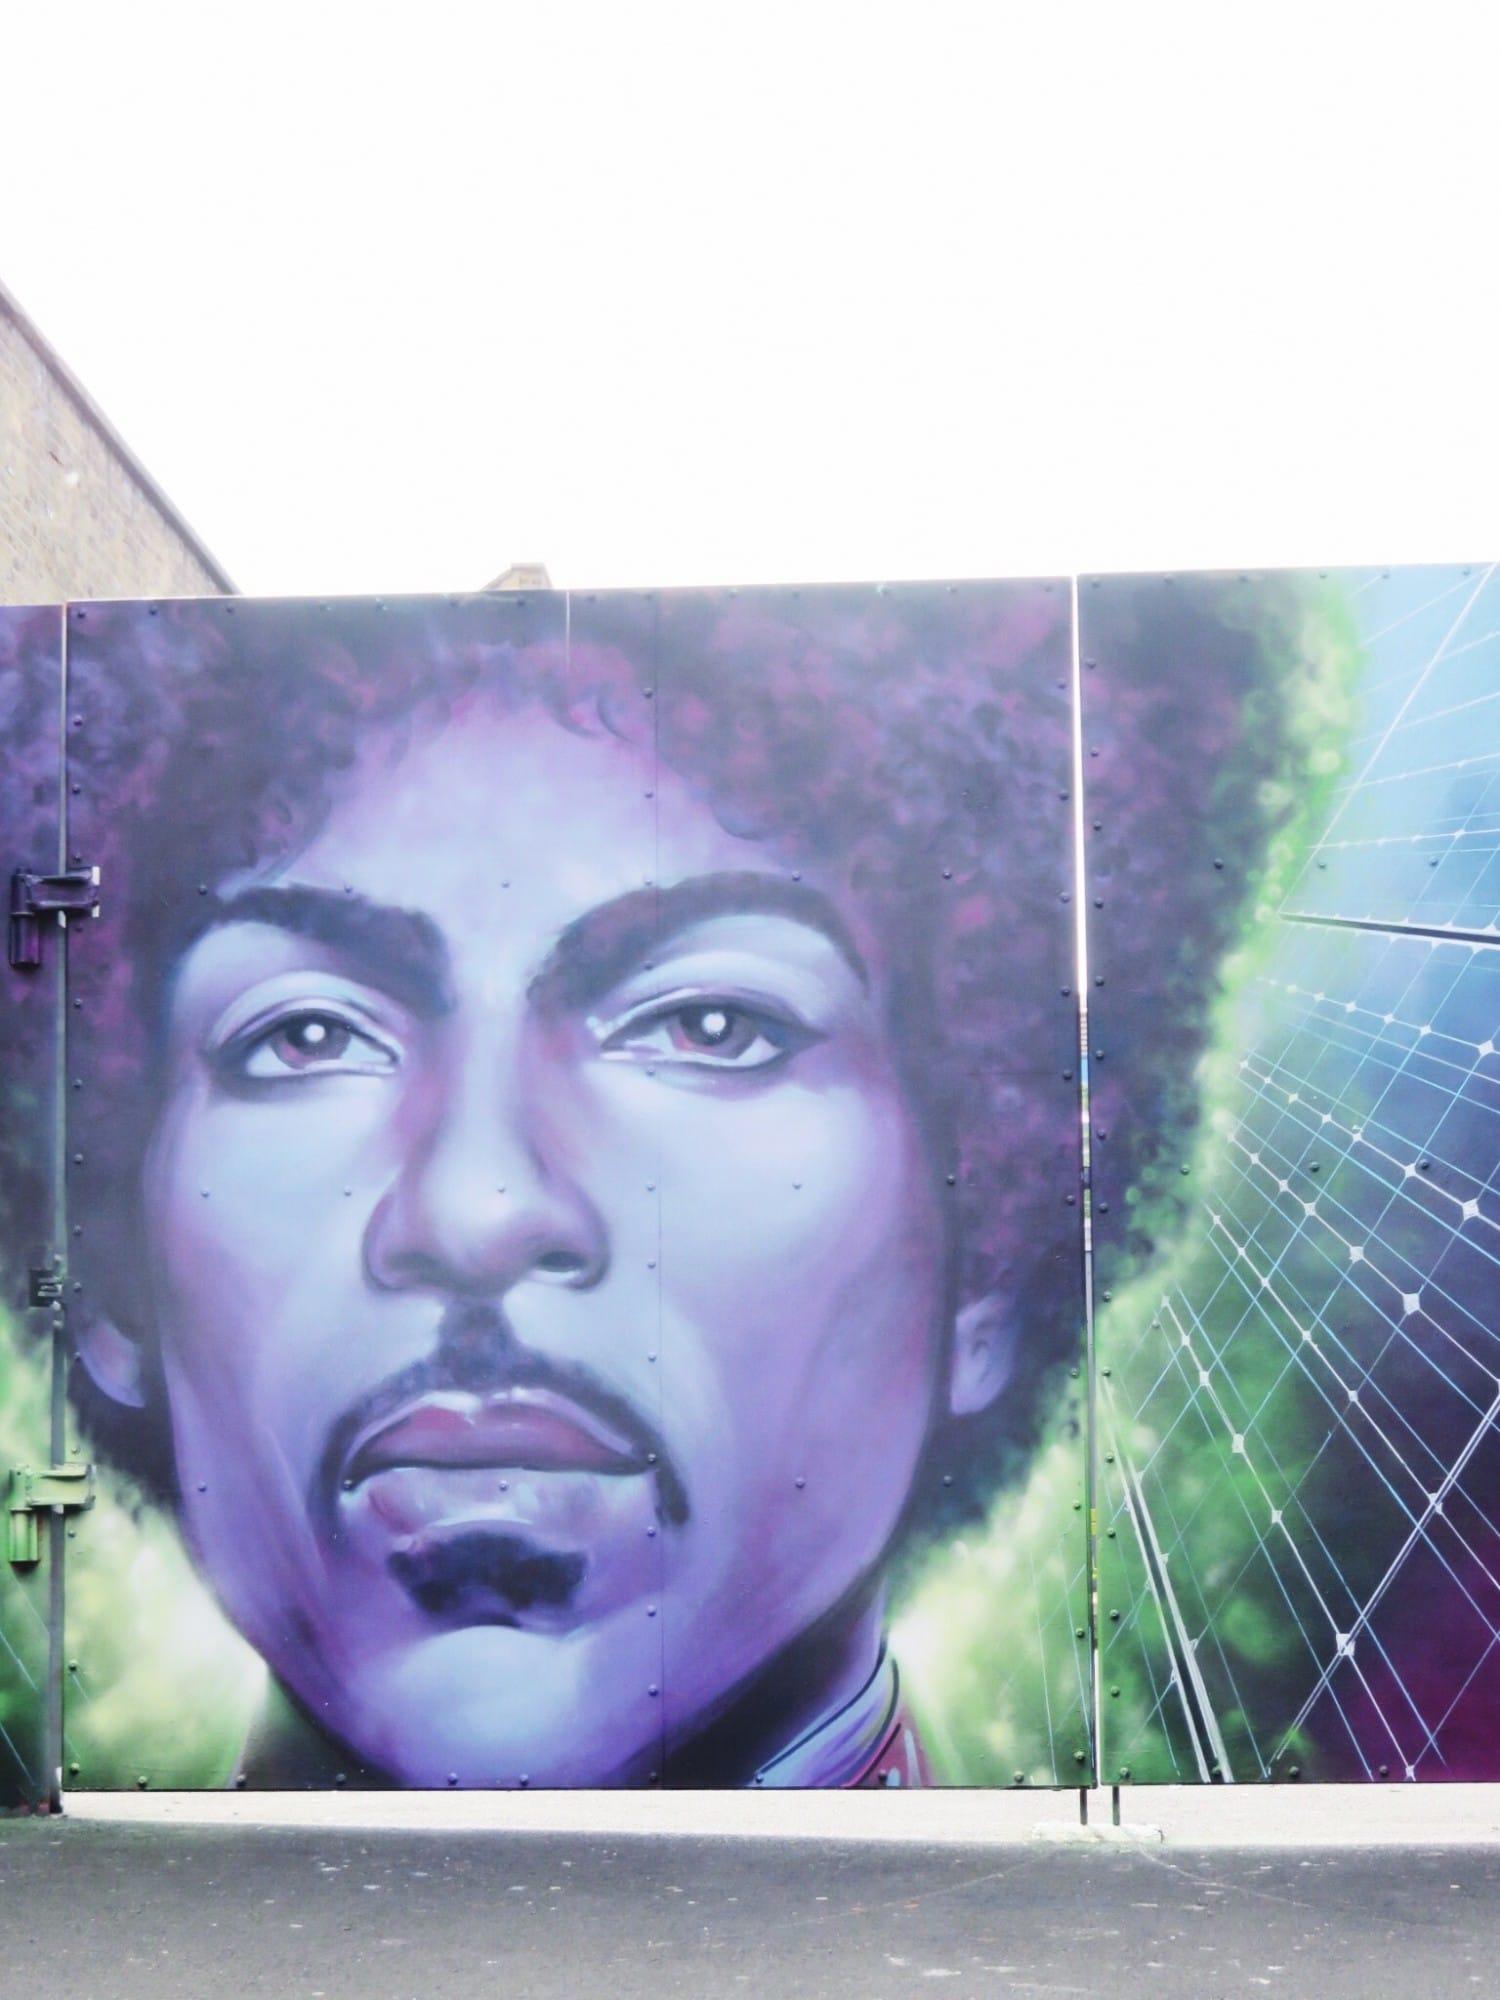 Prince Street Art Camden - Electric Ballroom